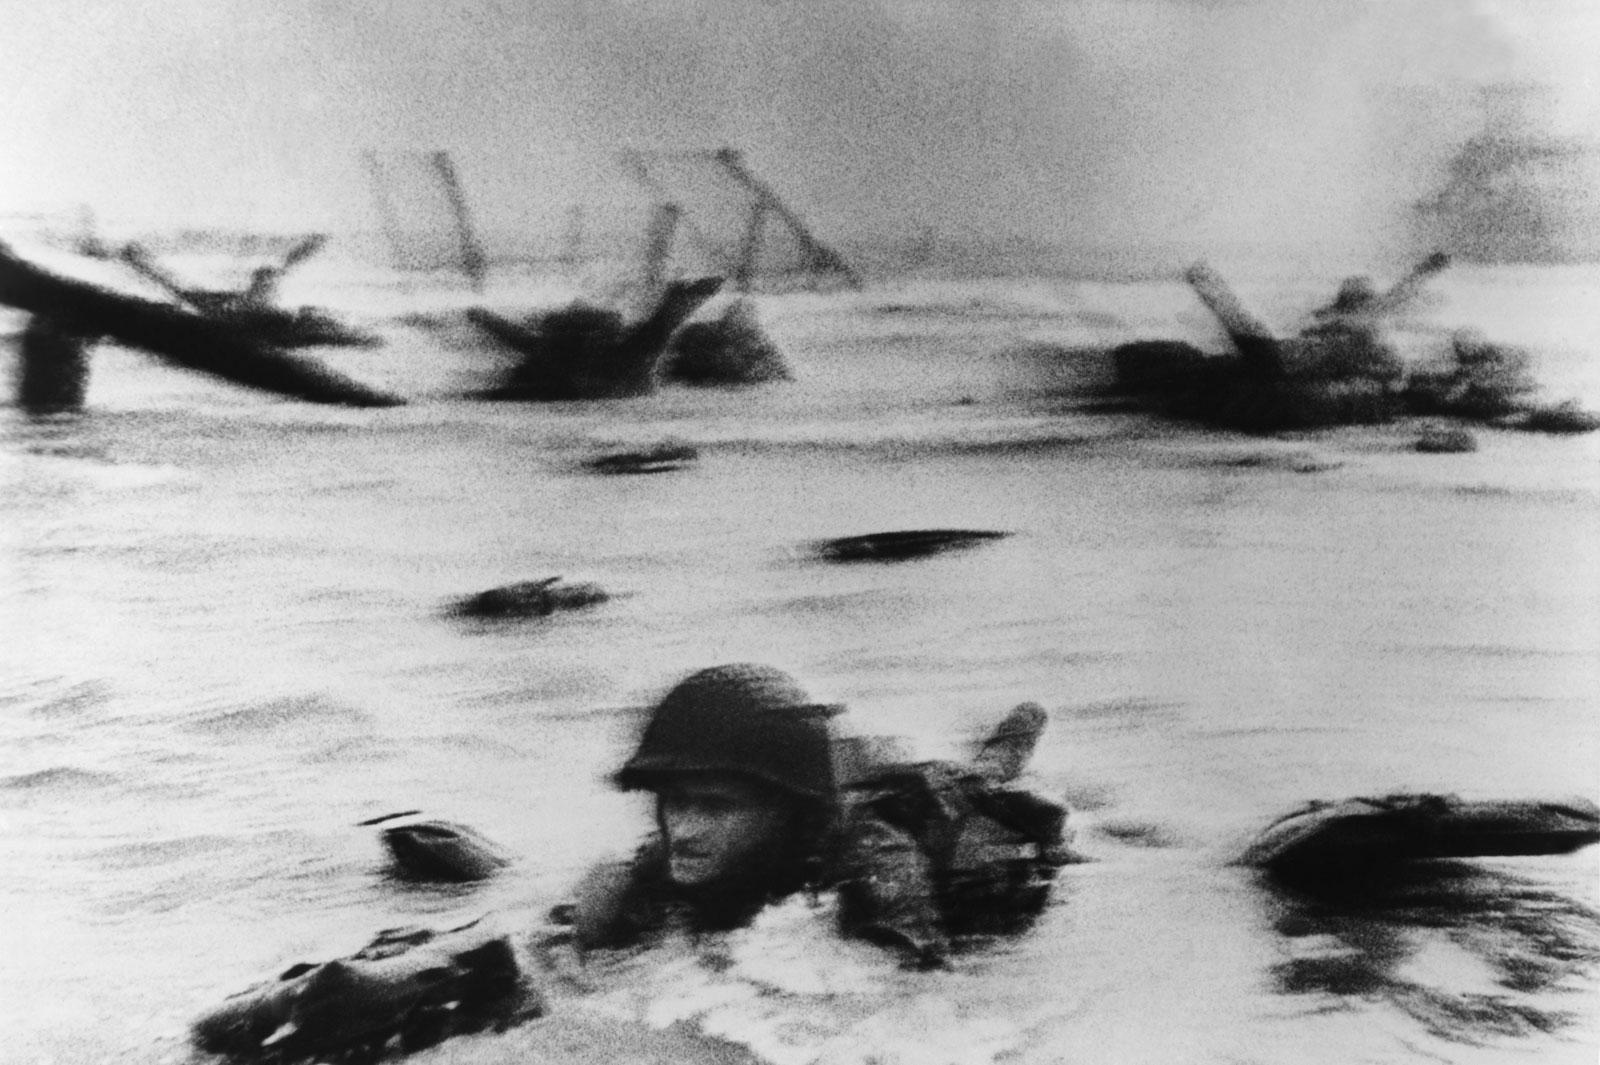 http://skyethelimit.files.wordpress.com/2011/08/d-day-landings-6-6-1944.jpg